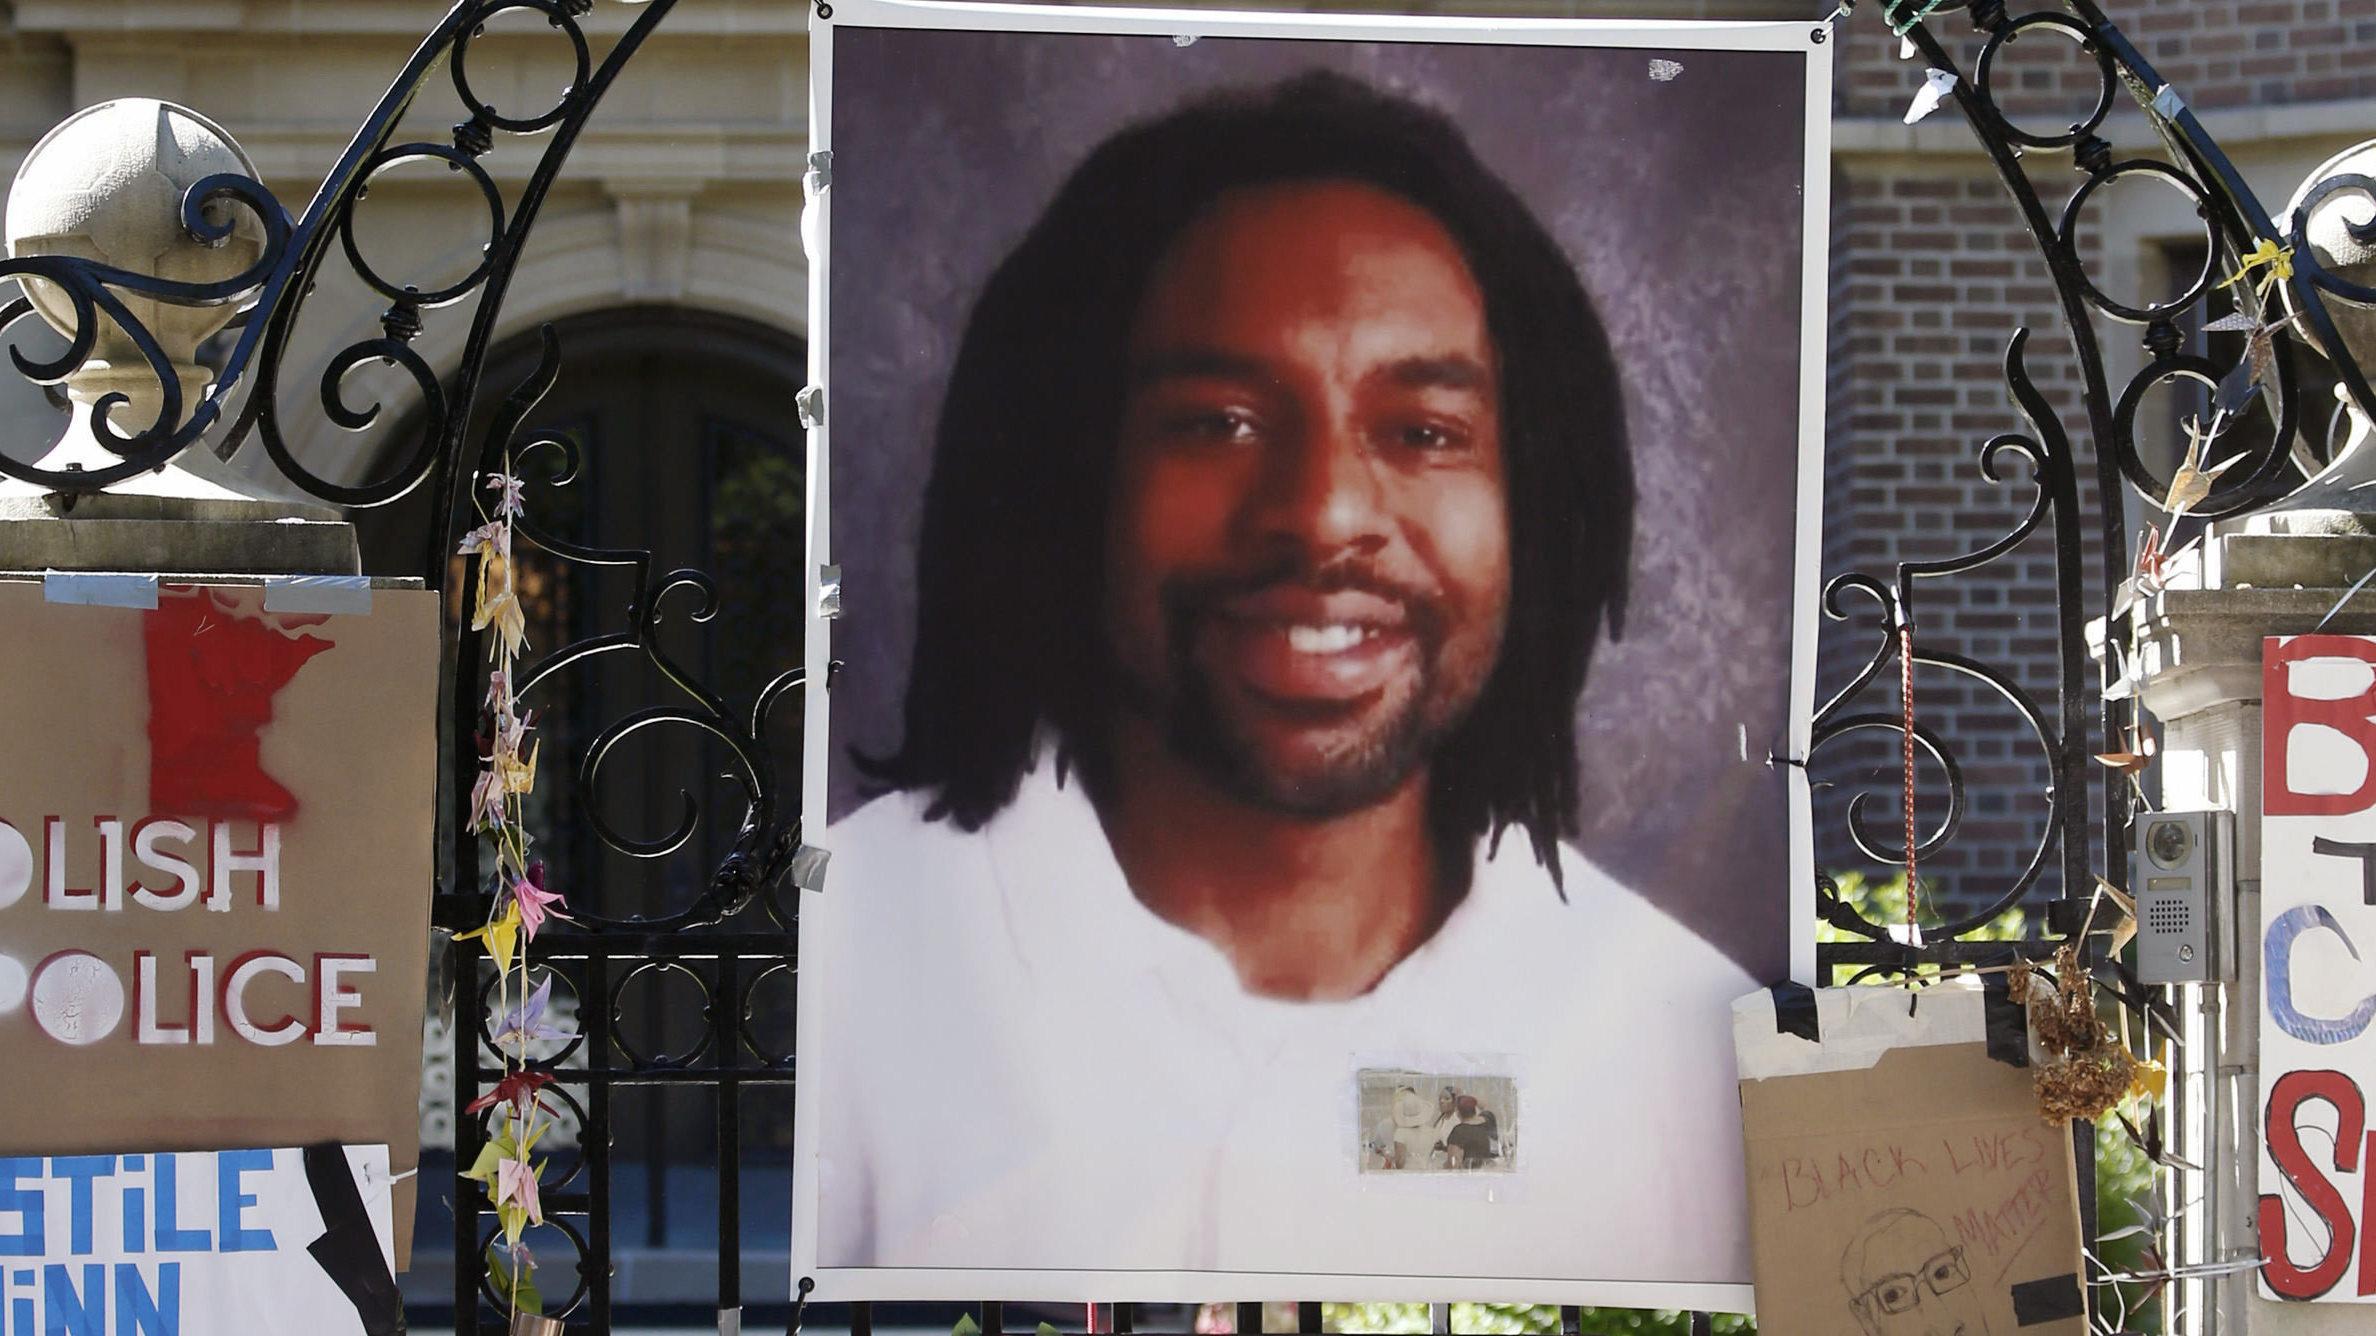 Minnesota Police Officer In Philando Castile Shooting Case Pleads Not Guilty